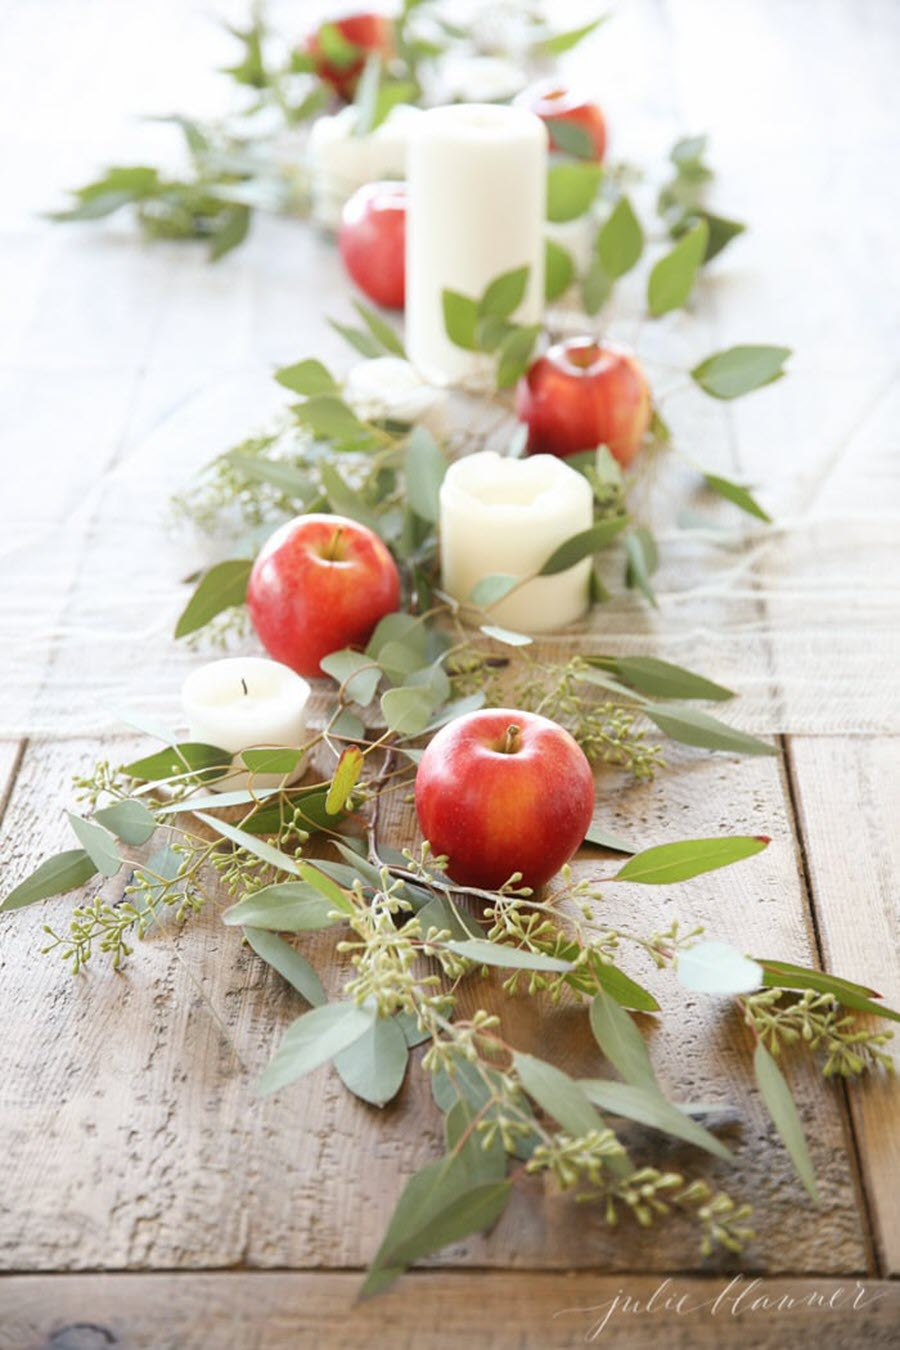 Thanksgiving Table Decor Ideas - Apple Eucalyptus Table Runner